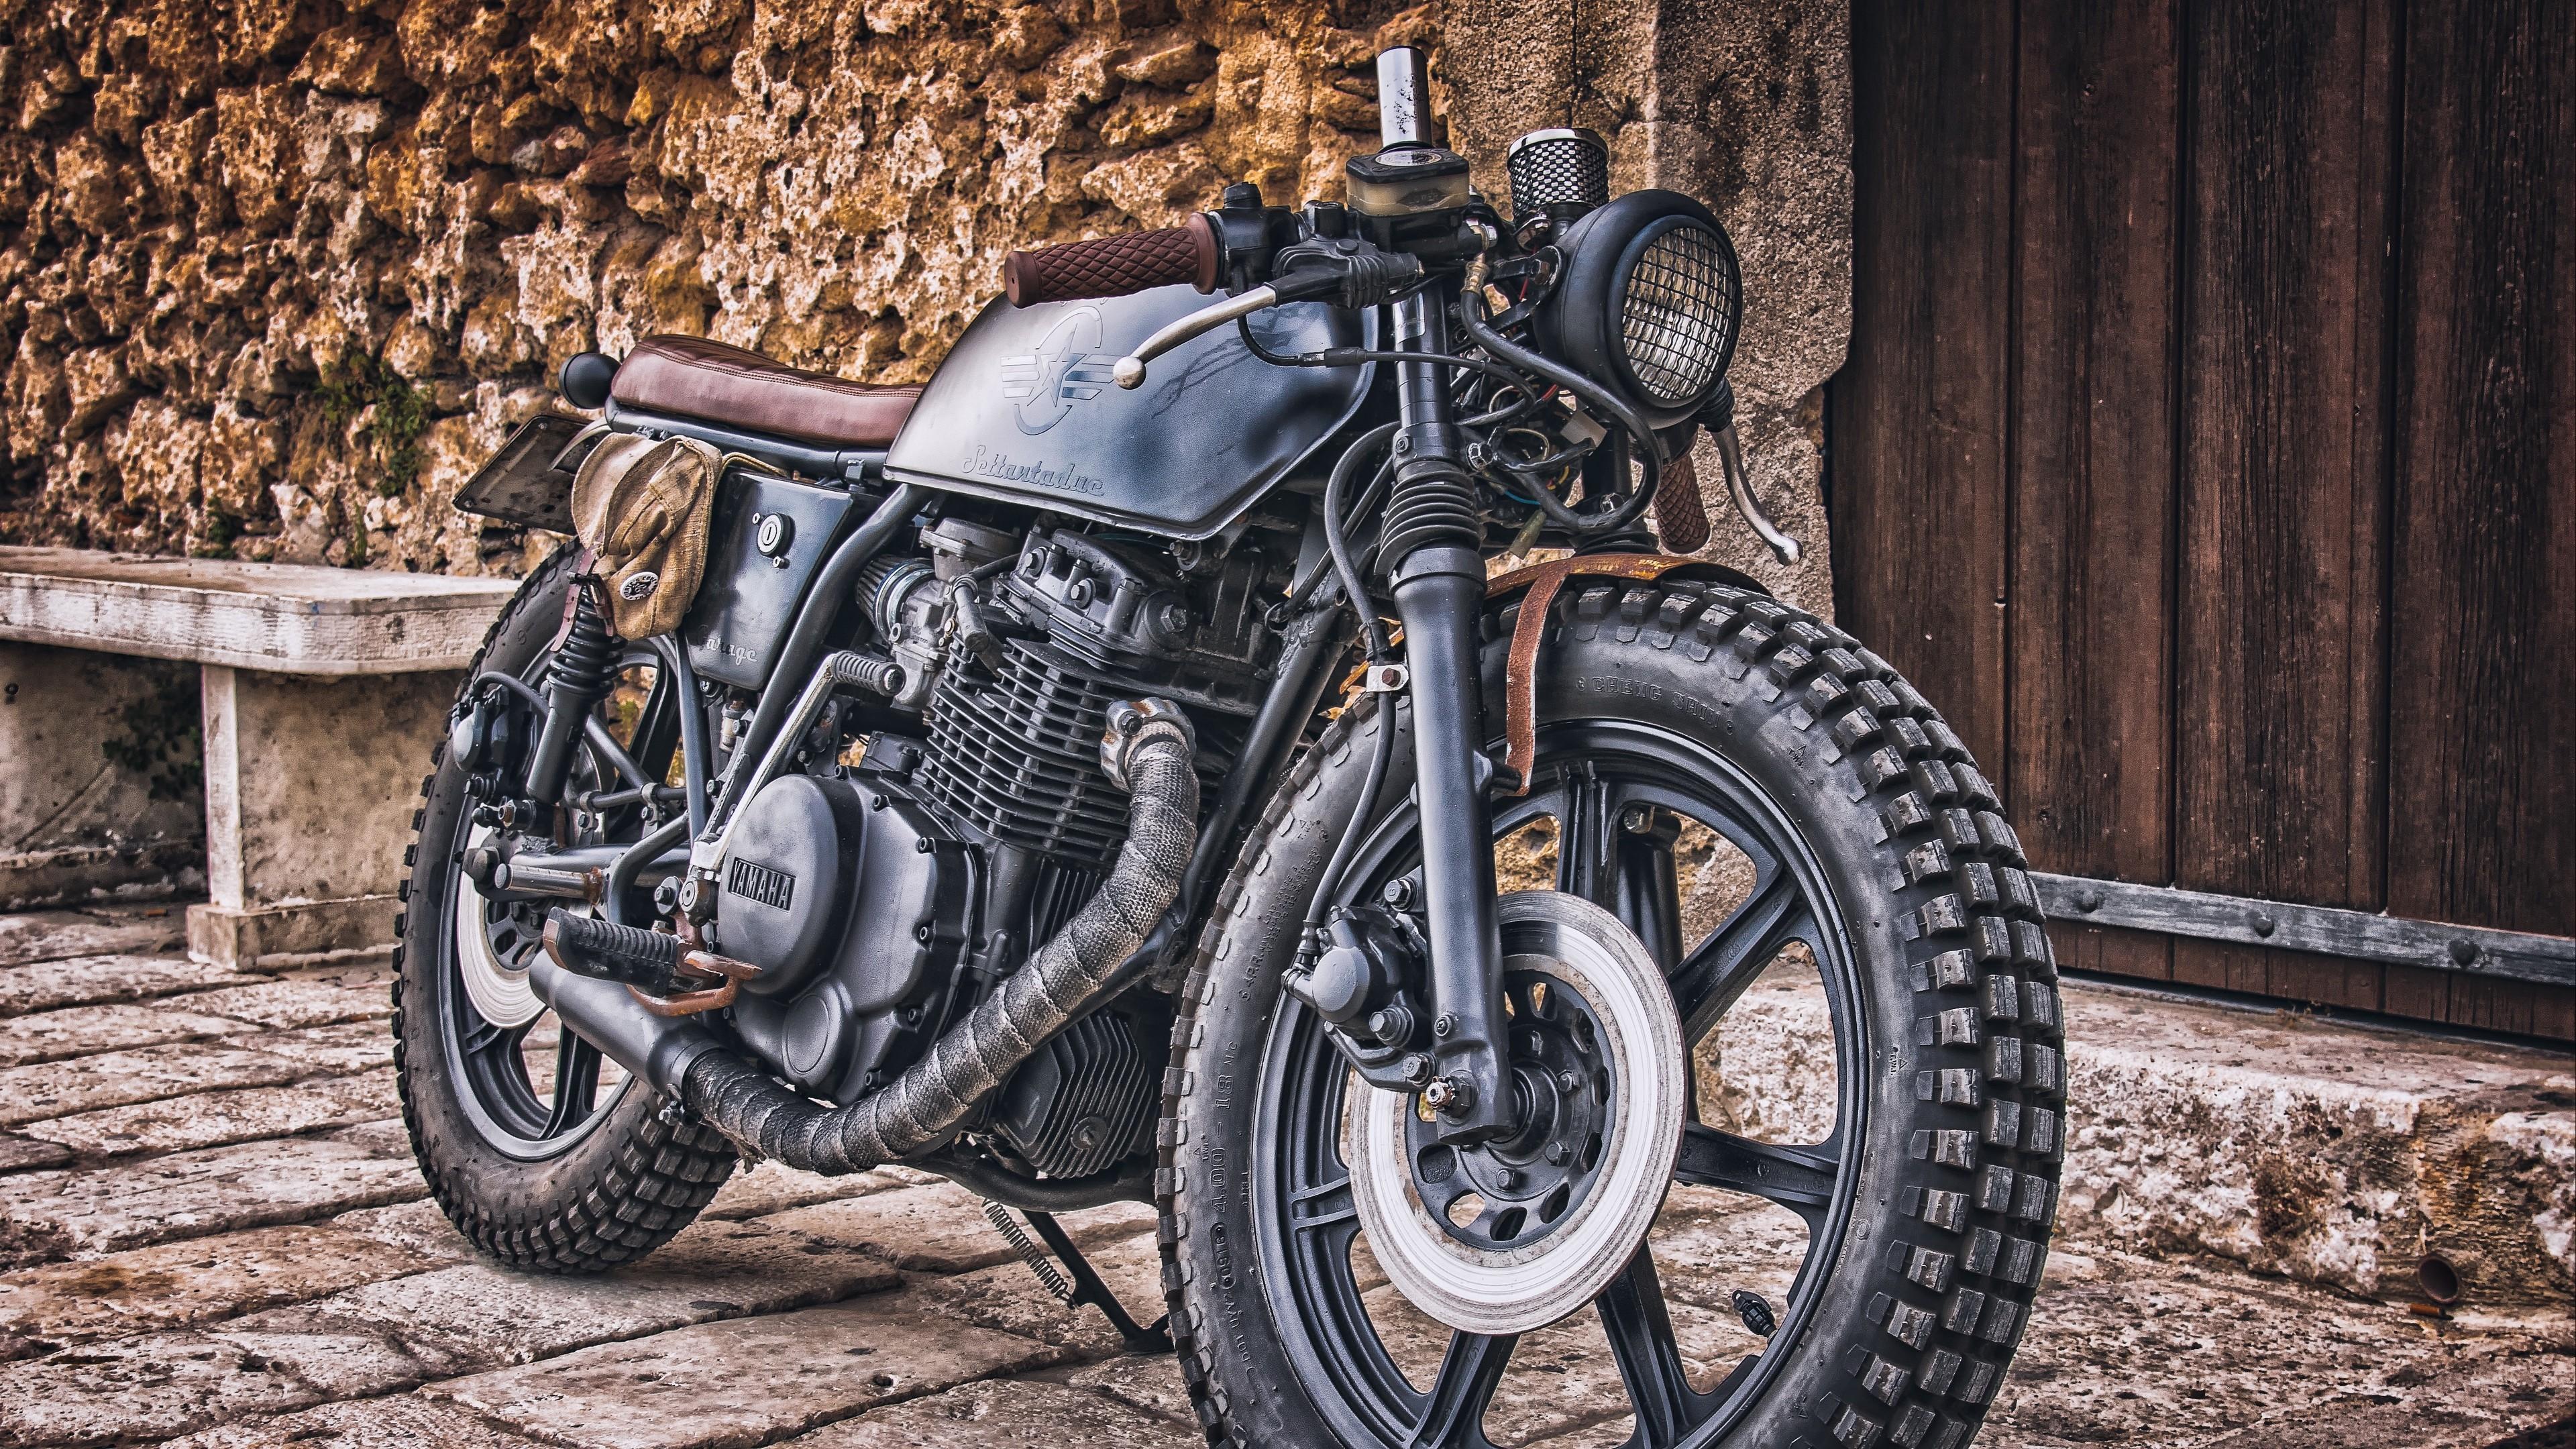 Res: 3840x2160, yamaha, motorcycle, cruiser, hdr 4k